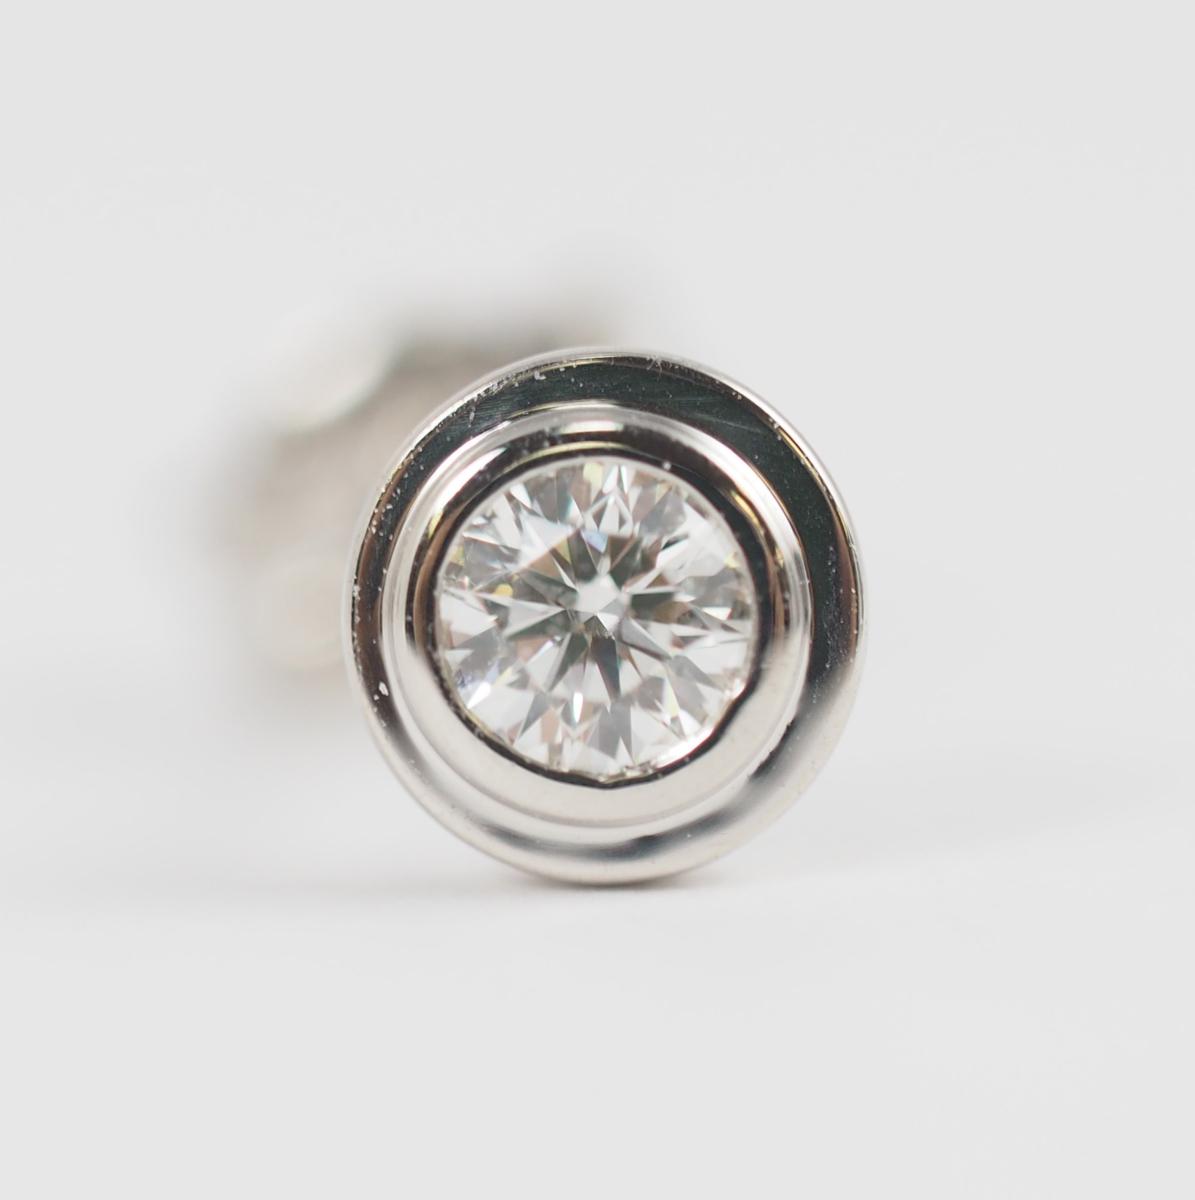 VENDOME AOYAMA ヴァンドーム青山 1粒ダイヤモンド(石目なし) Pt950/900 ピアス [22832]_画像7